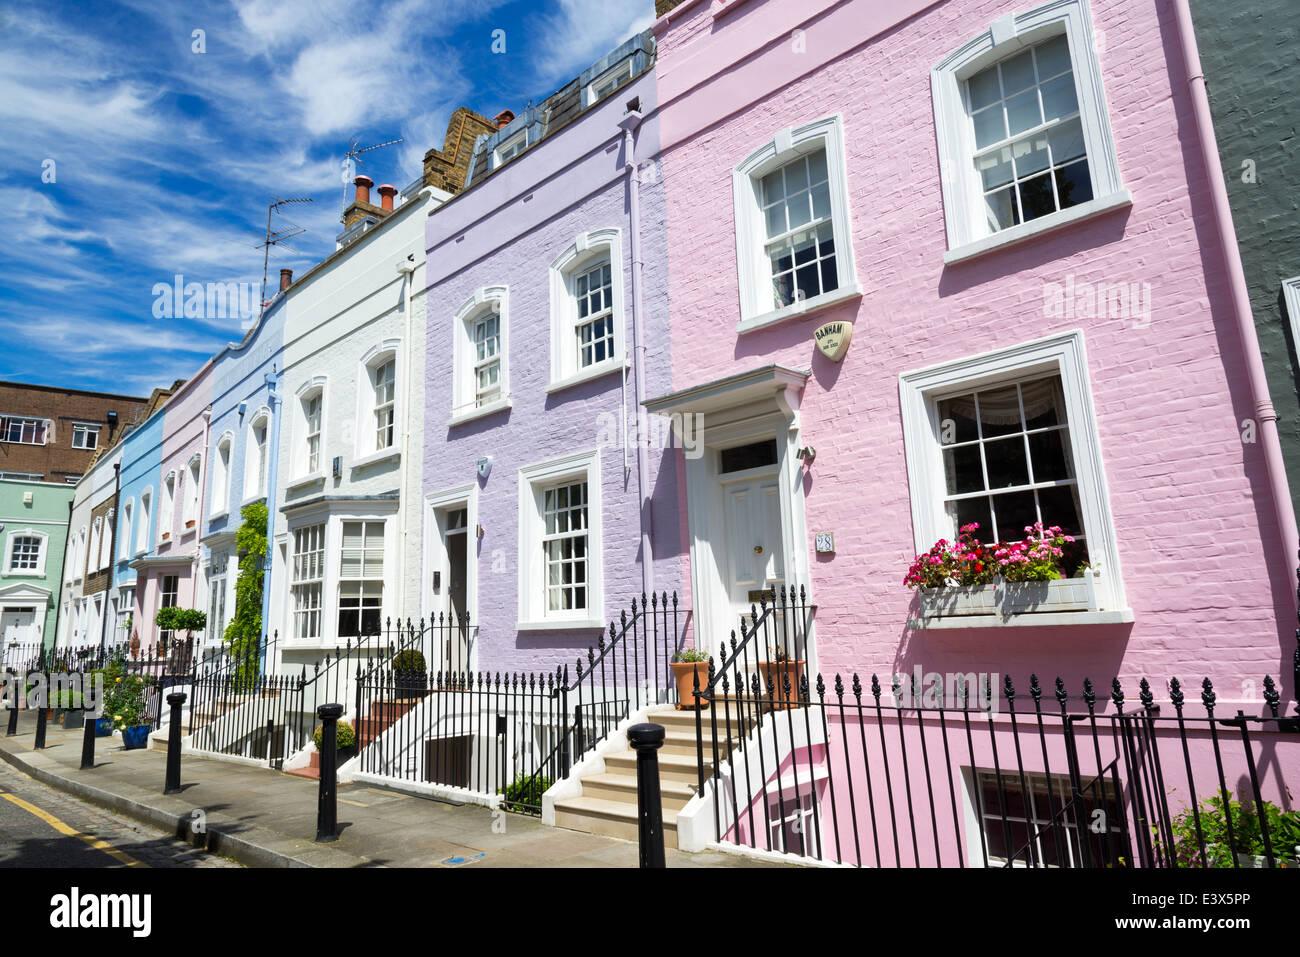 Hilera de coloridas casas adosadas de Bywater Street, Chelsea, Londres, Inglaterra, Reino Unido. Imagen De Stock